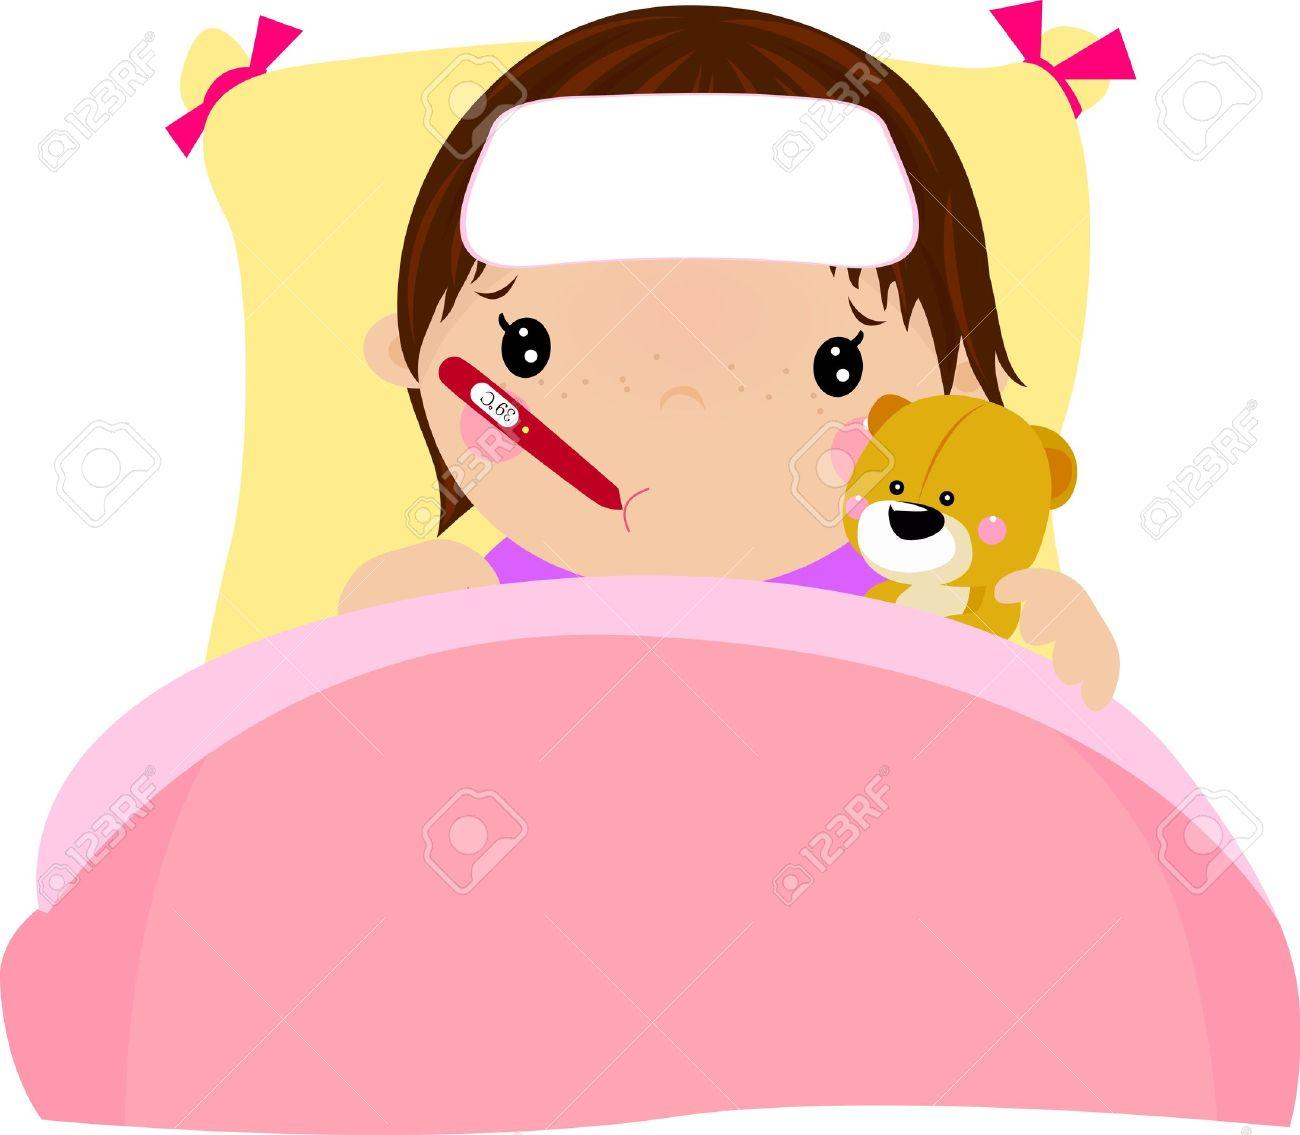 1300x1135 Hospital Clipart Sick Person